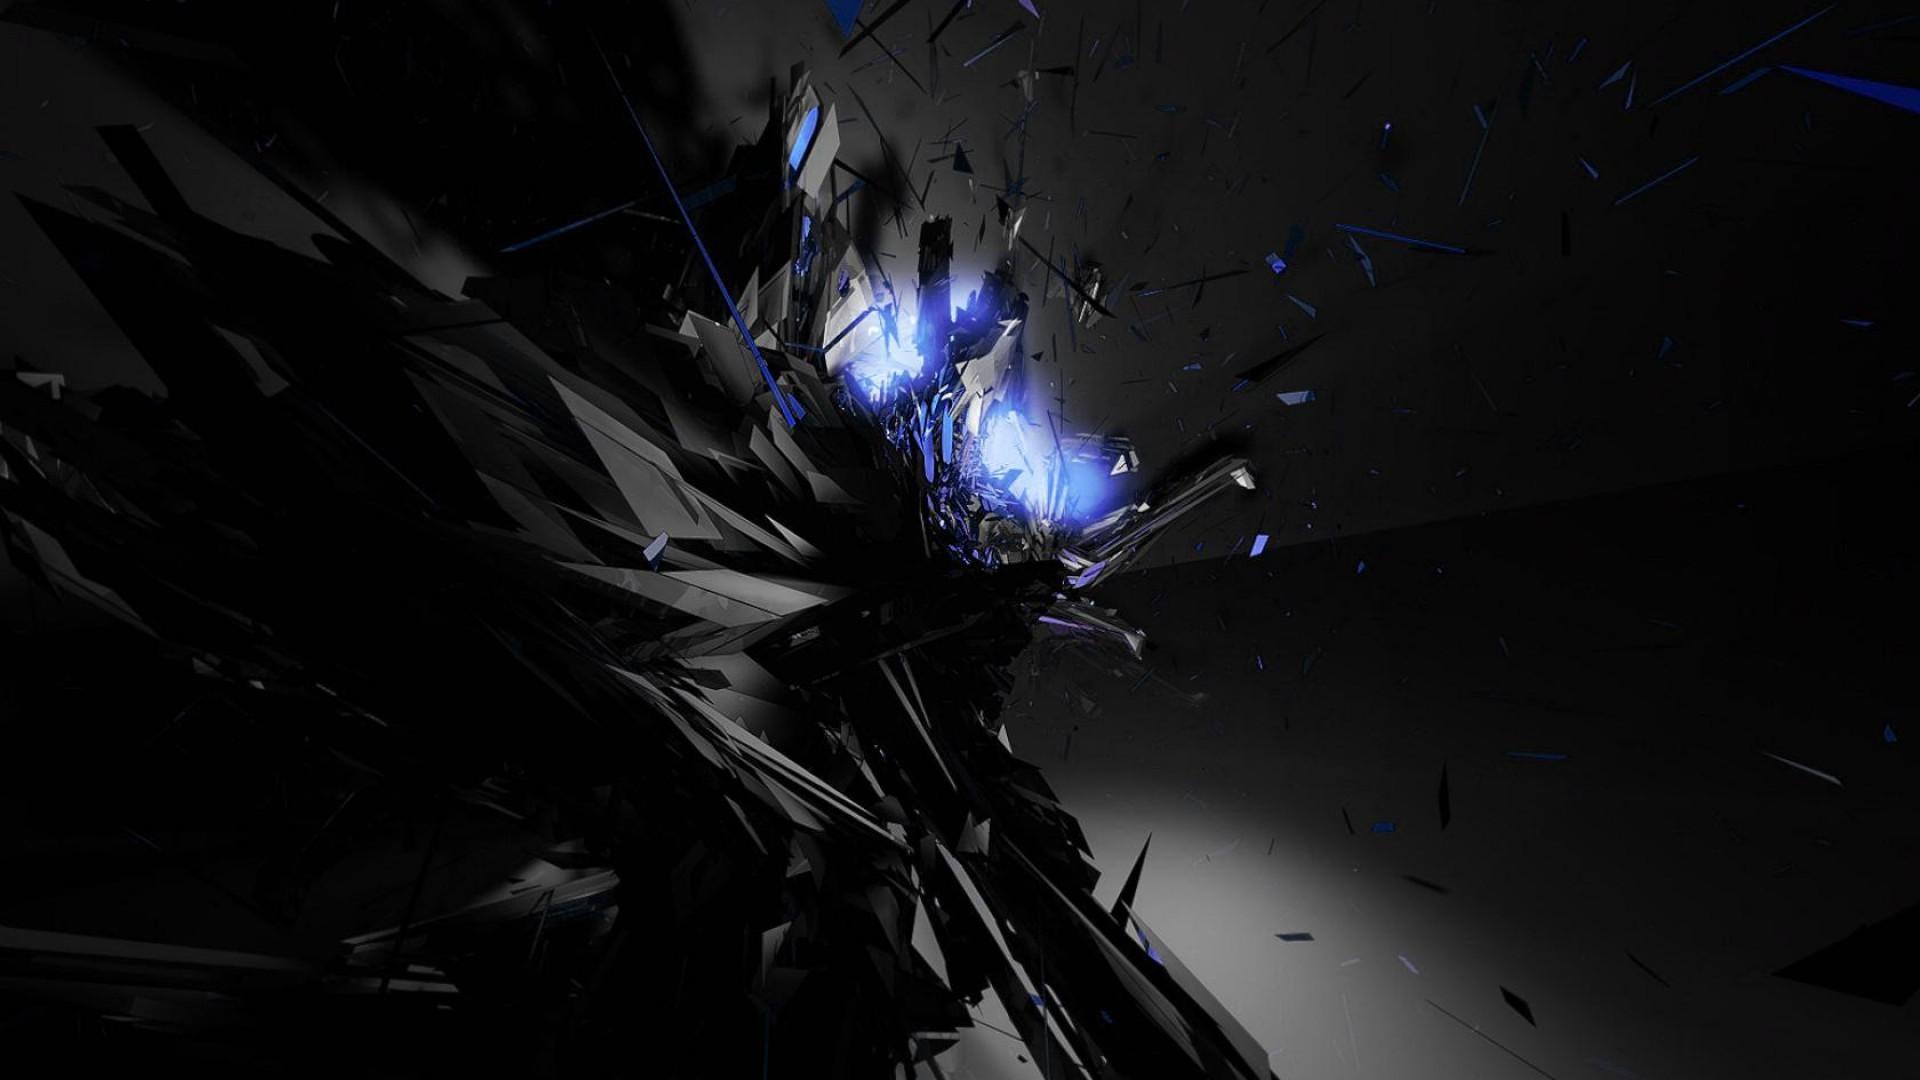 Abstract Darkness | Abstract Dark Wallpaper